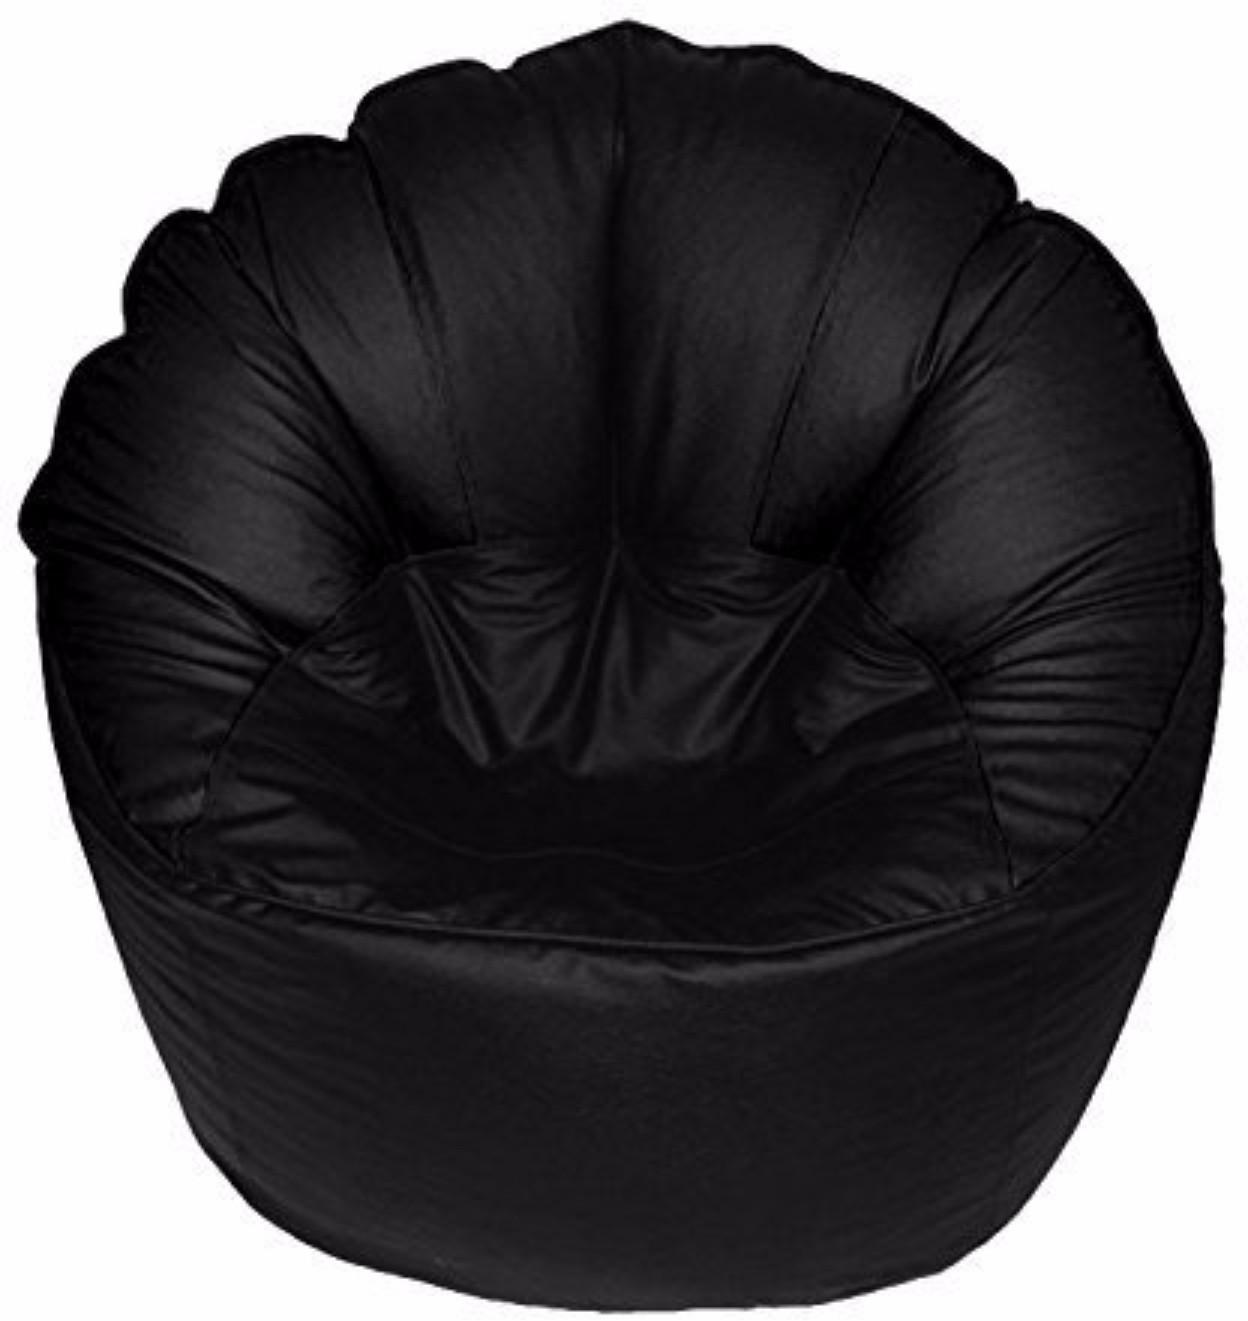 View VSK XXXL Bean Bag Cover(Black) Furniture (VSK)